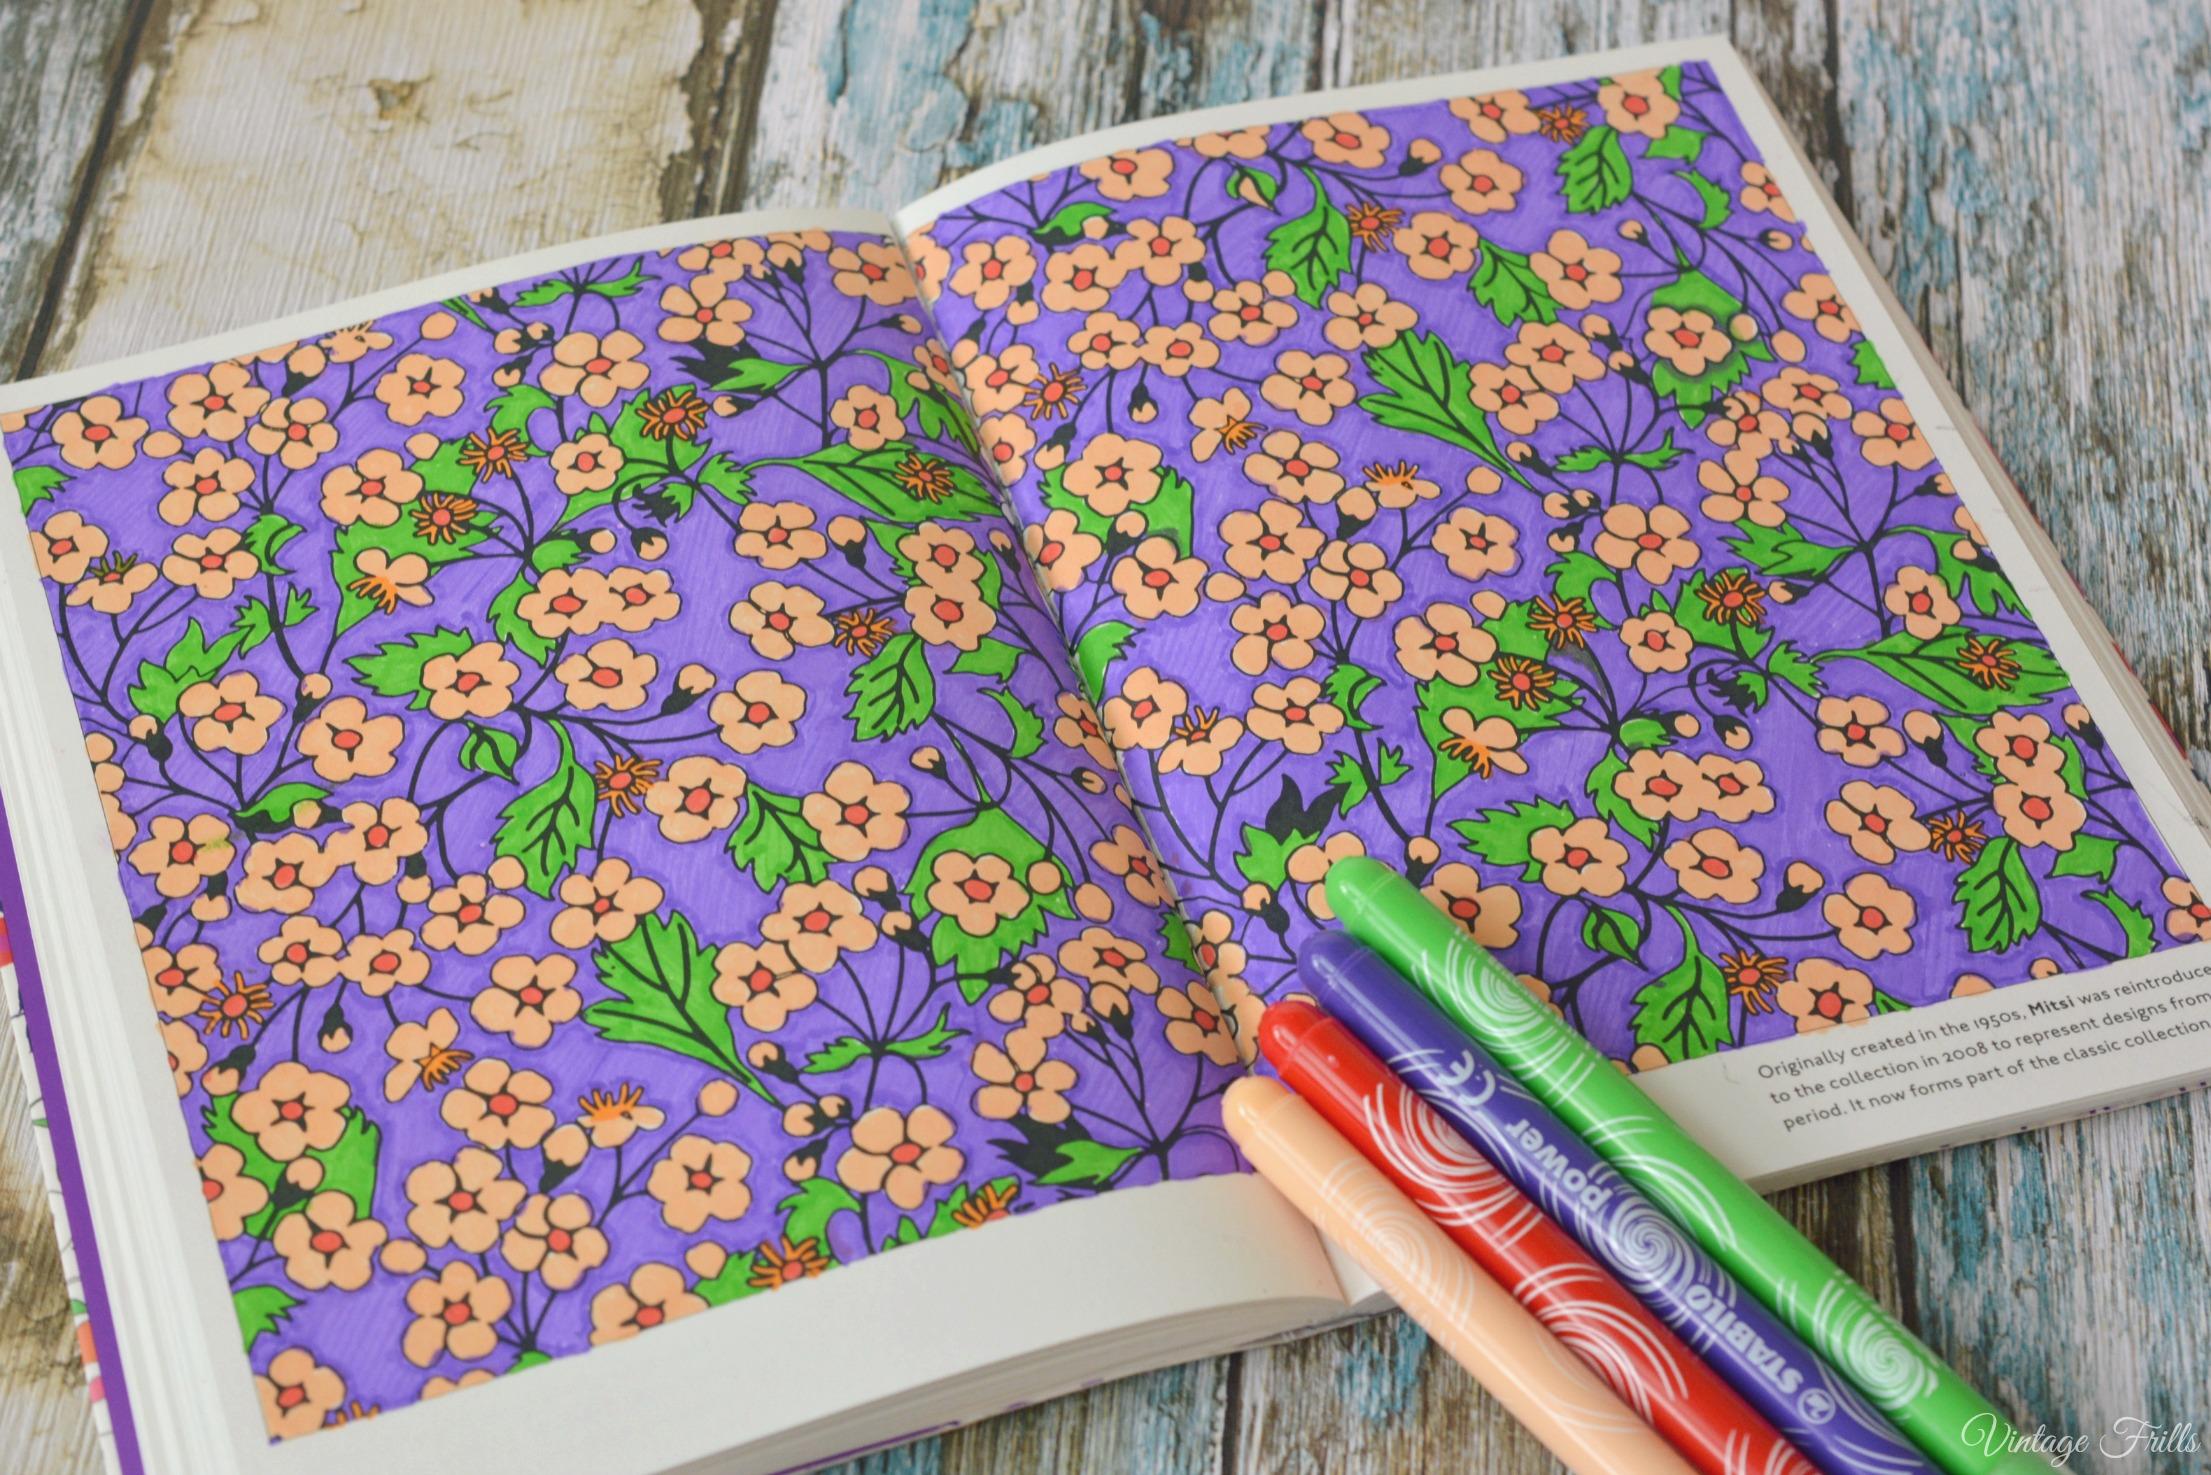 Libert colouring Book Mitsi Print